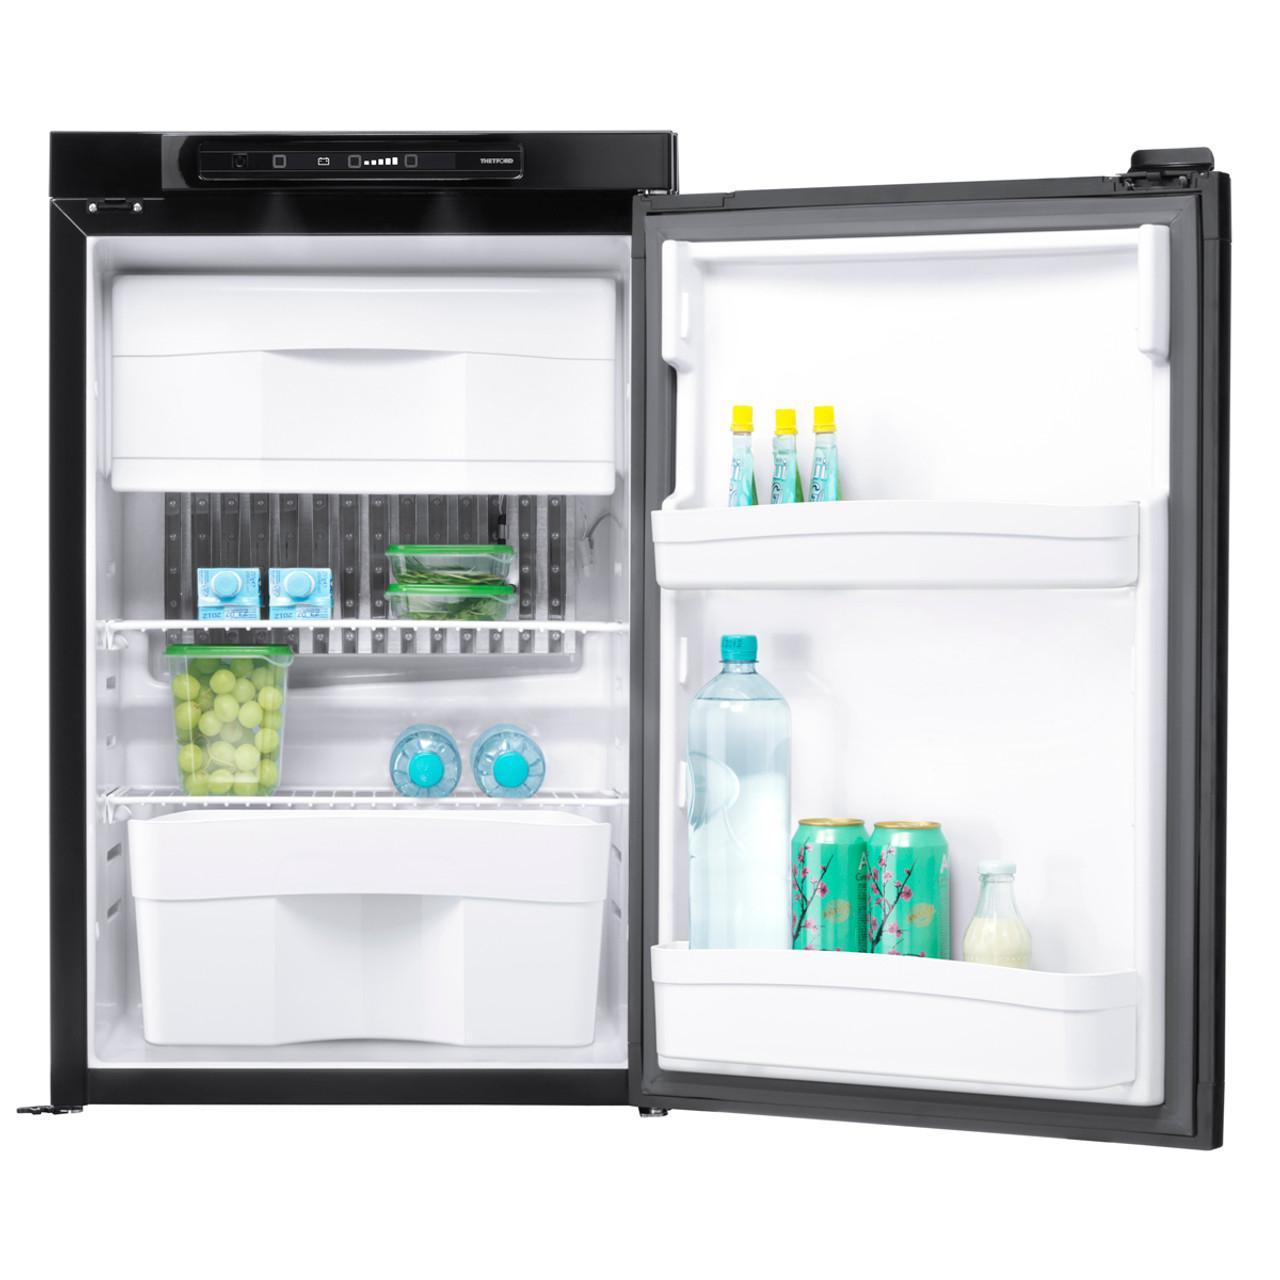 N3112 absorption refrigerator